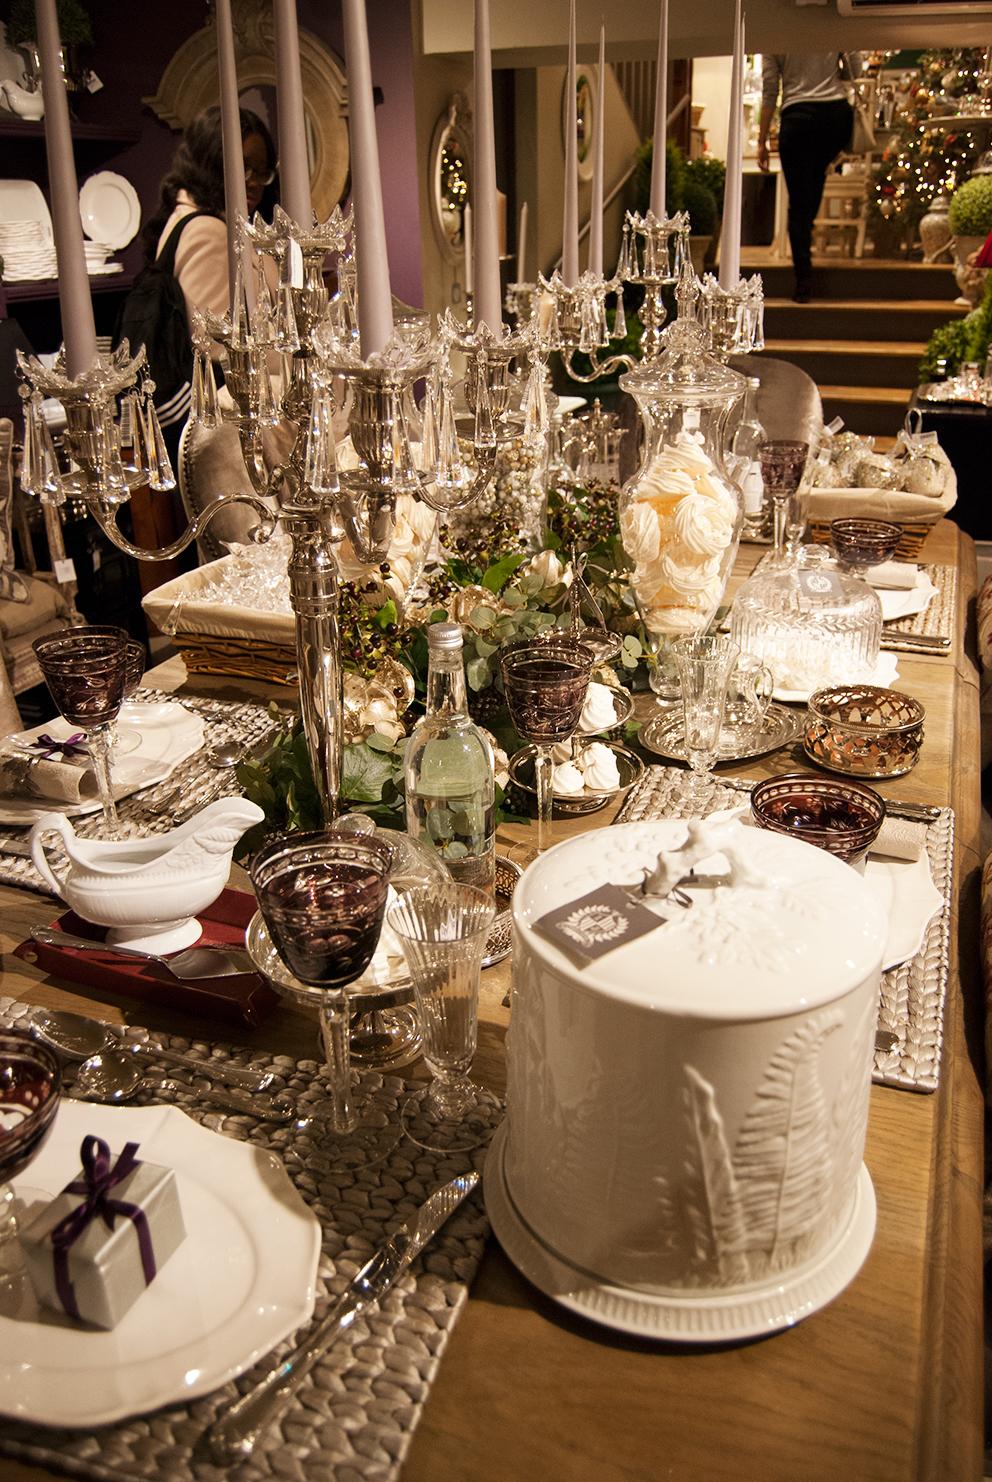 Glamorous table setting